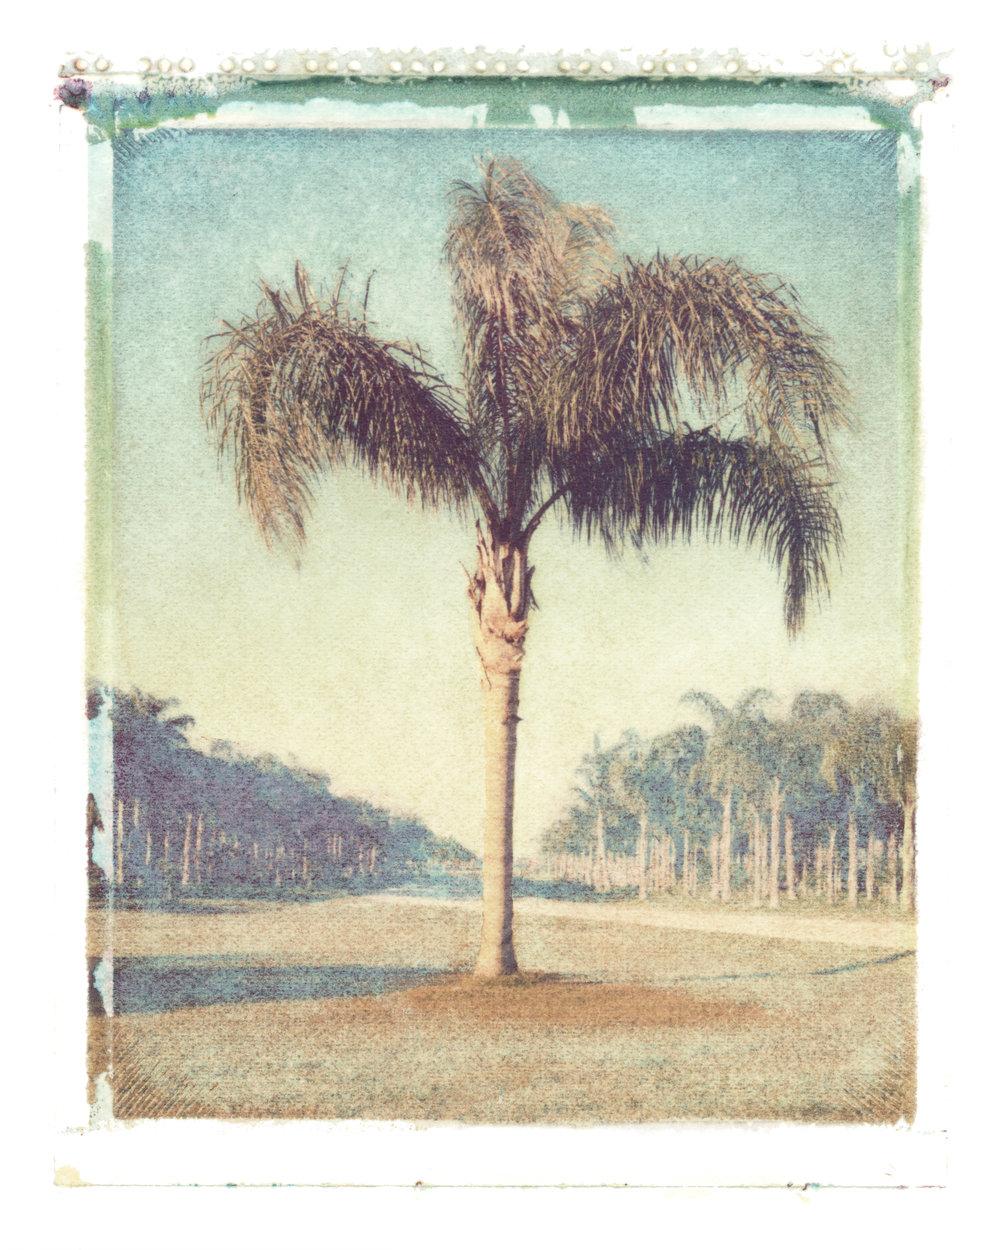 Syagrus romanzoffiana  Loxahatchee, Florida, 1996